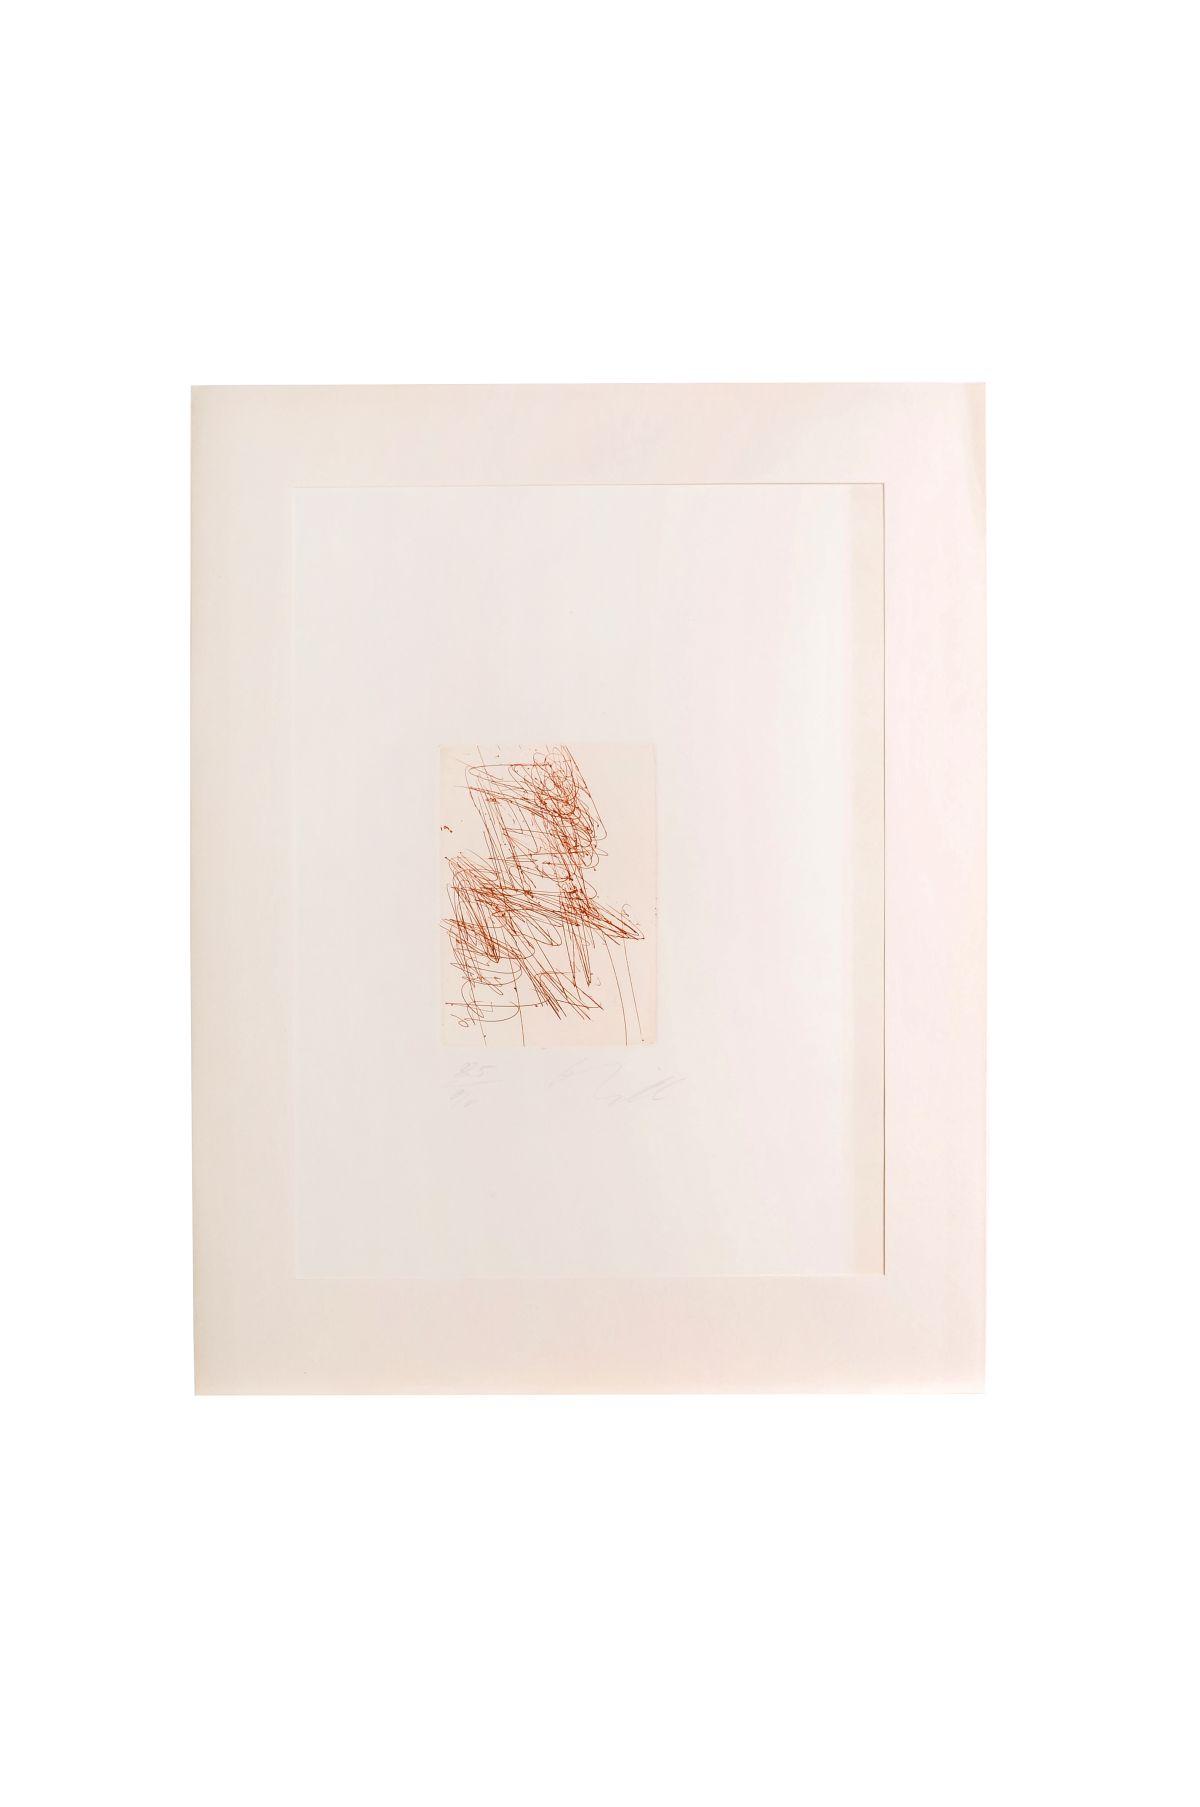 "#86 Josef Mikl ""Untitled"" | Josef Mikl (1929 - 2008)""Ohne Titel"" Image"